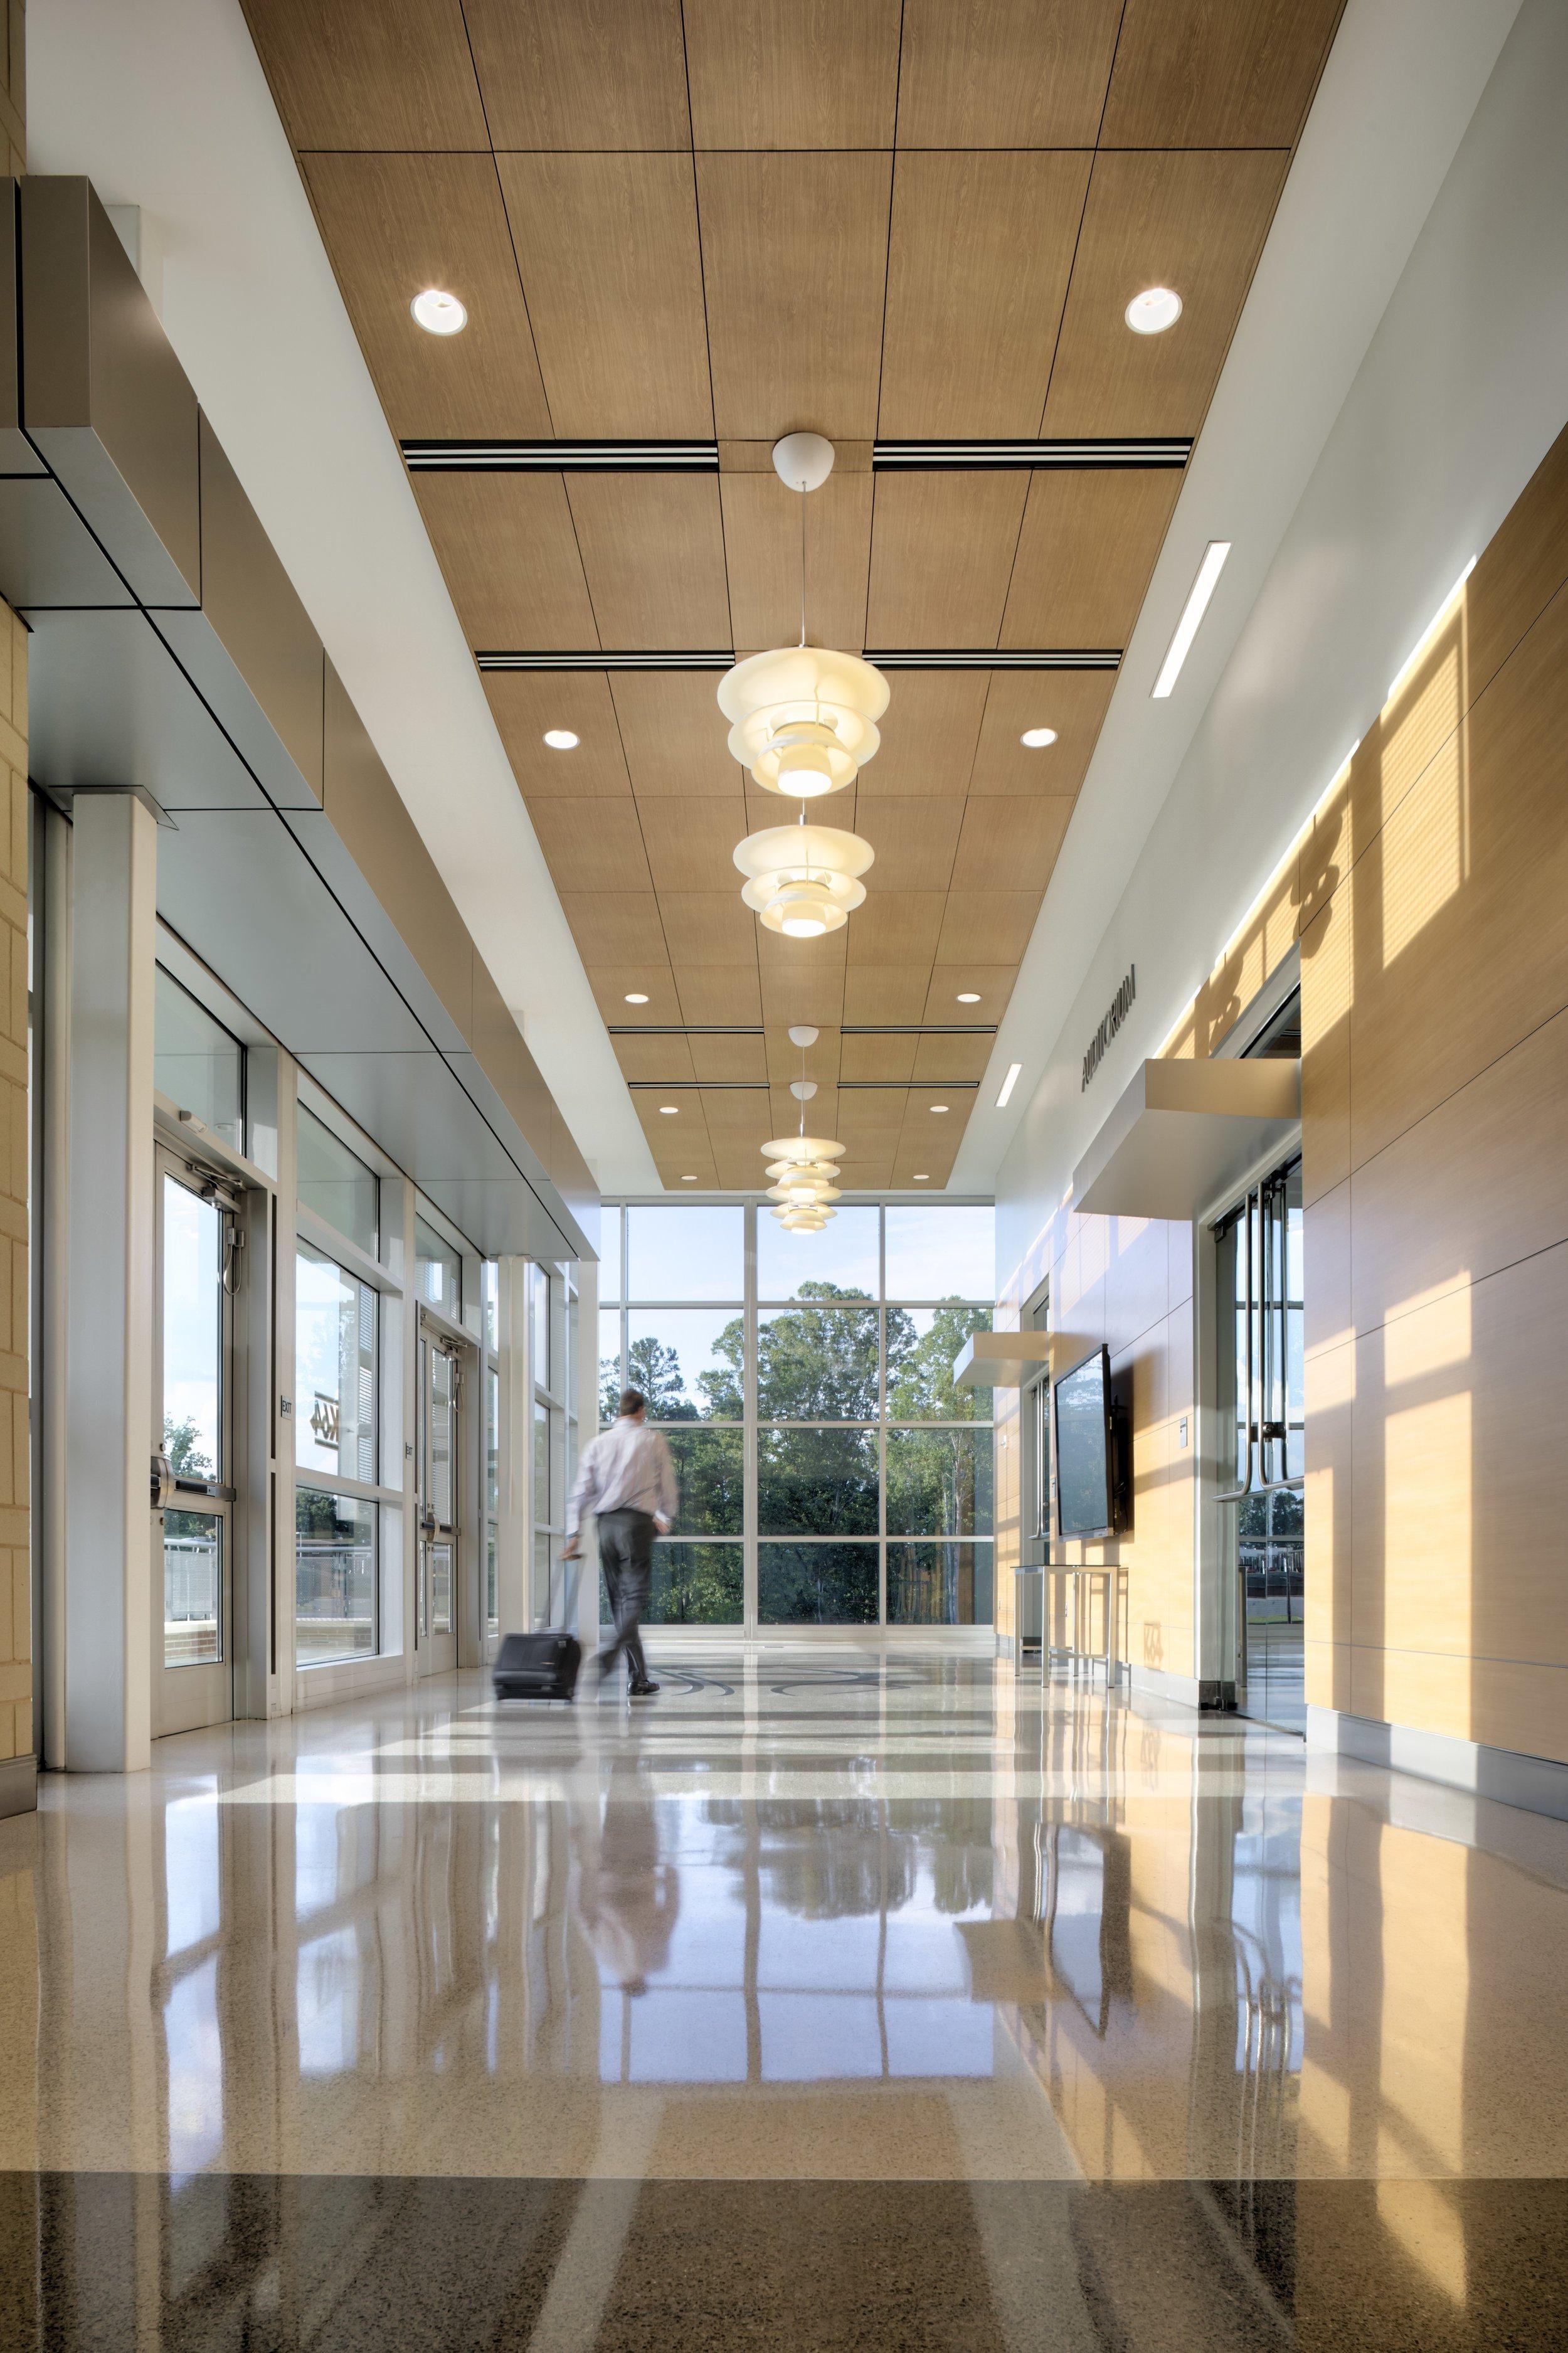 ADW-Higher-Education-CVCC-Hickory-NC-Workforce-Solutions-Interior-Entrance.jpg